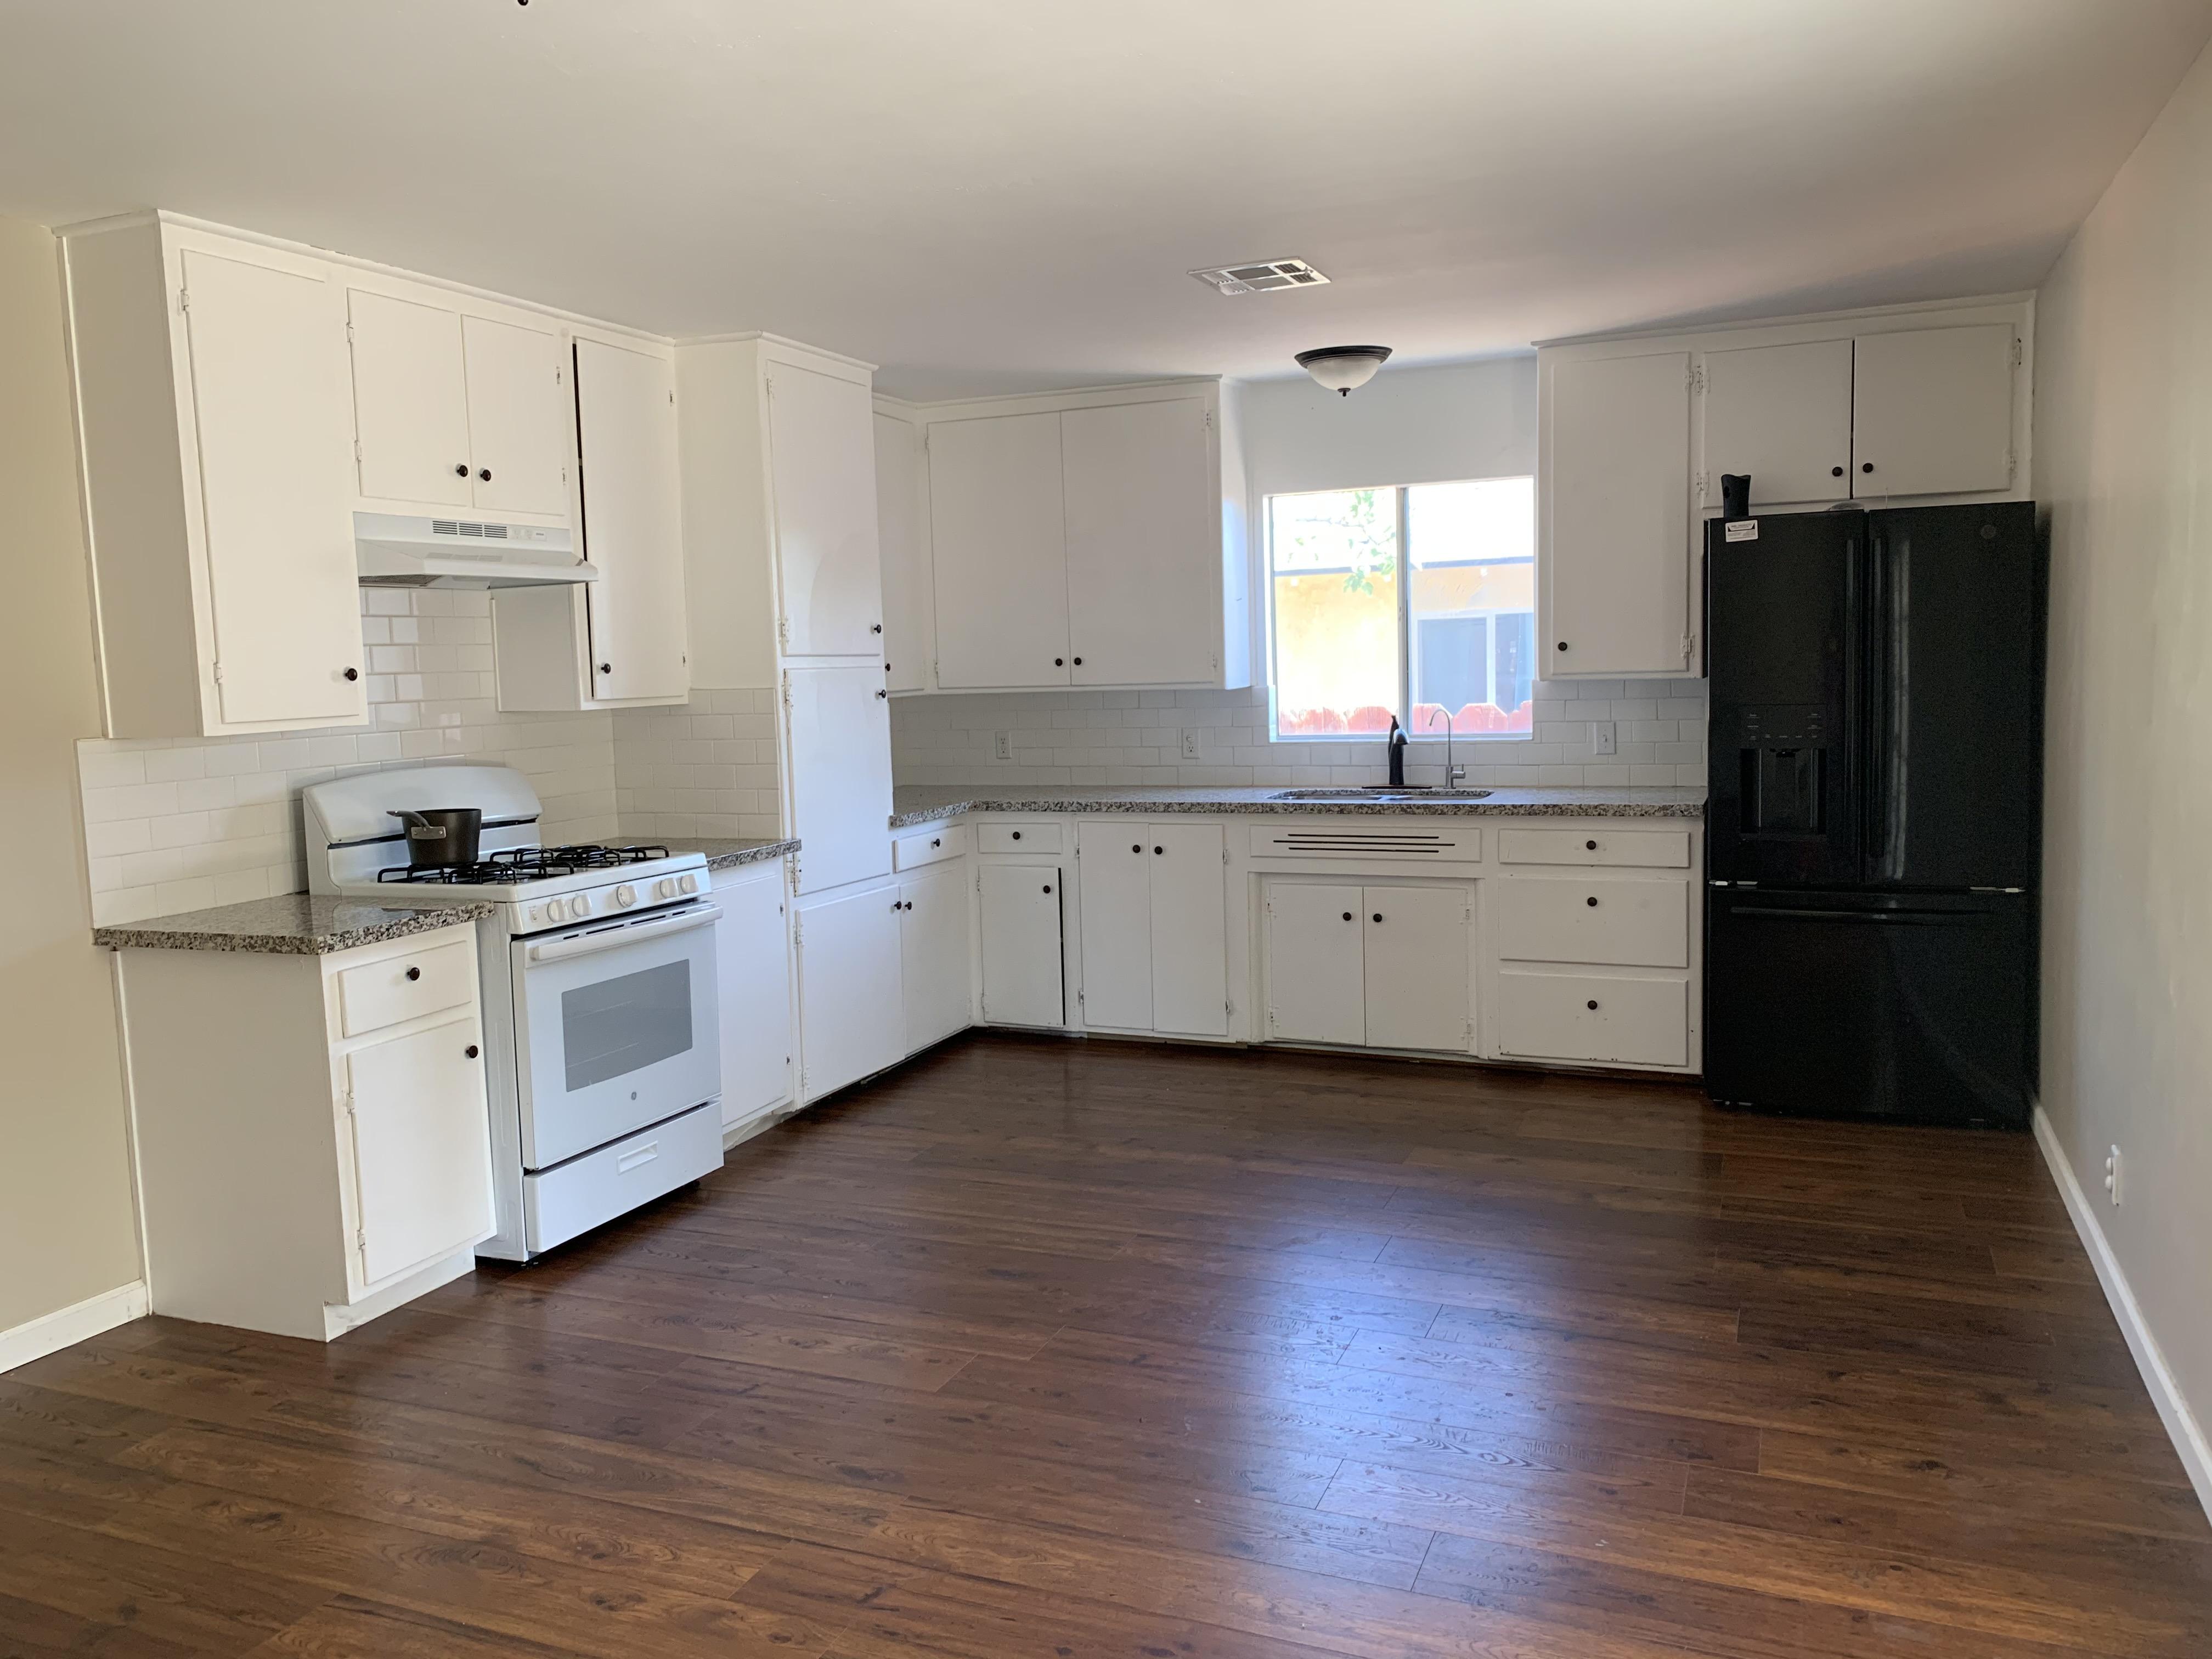 2114 Flint kitchen